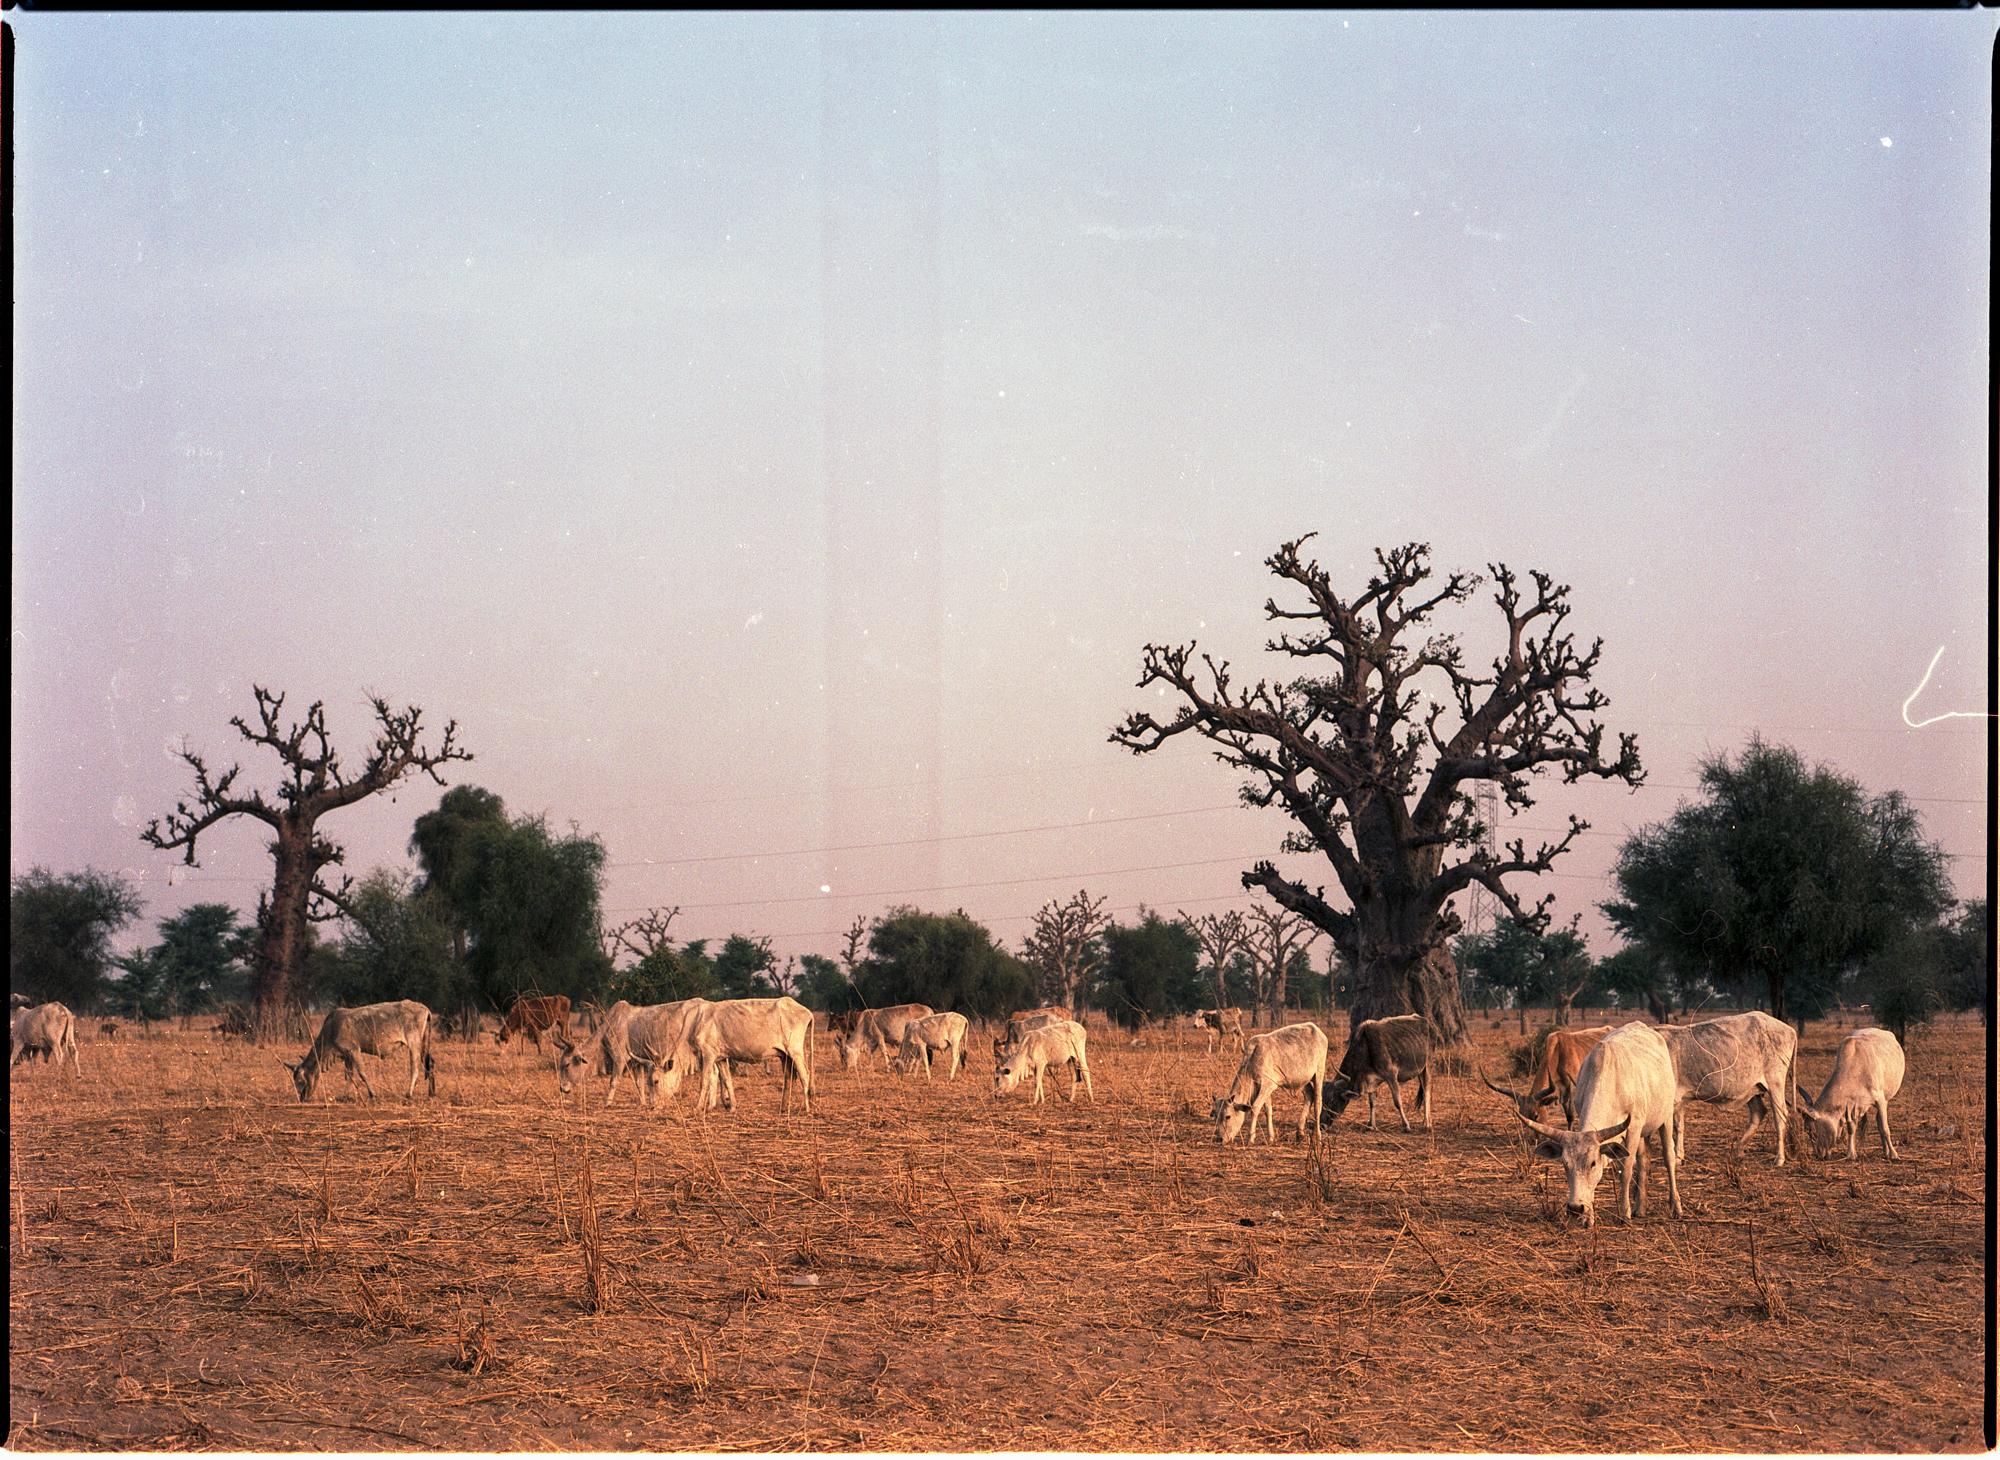 Africa_9.jpg